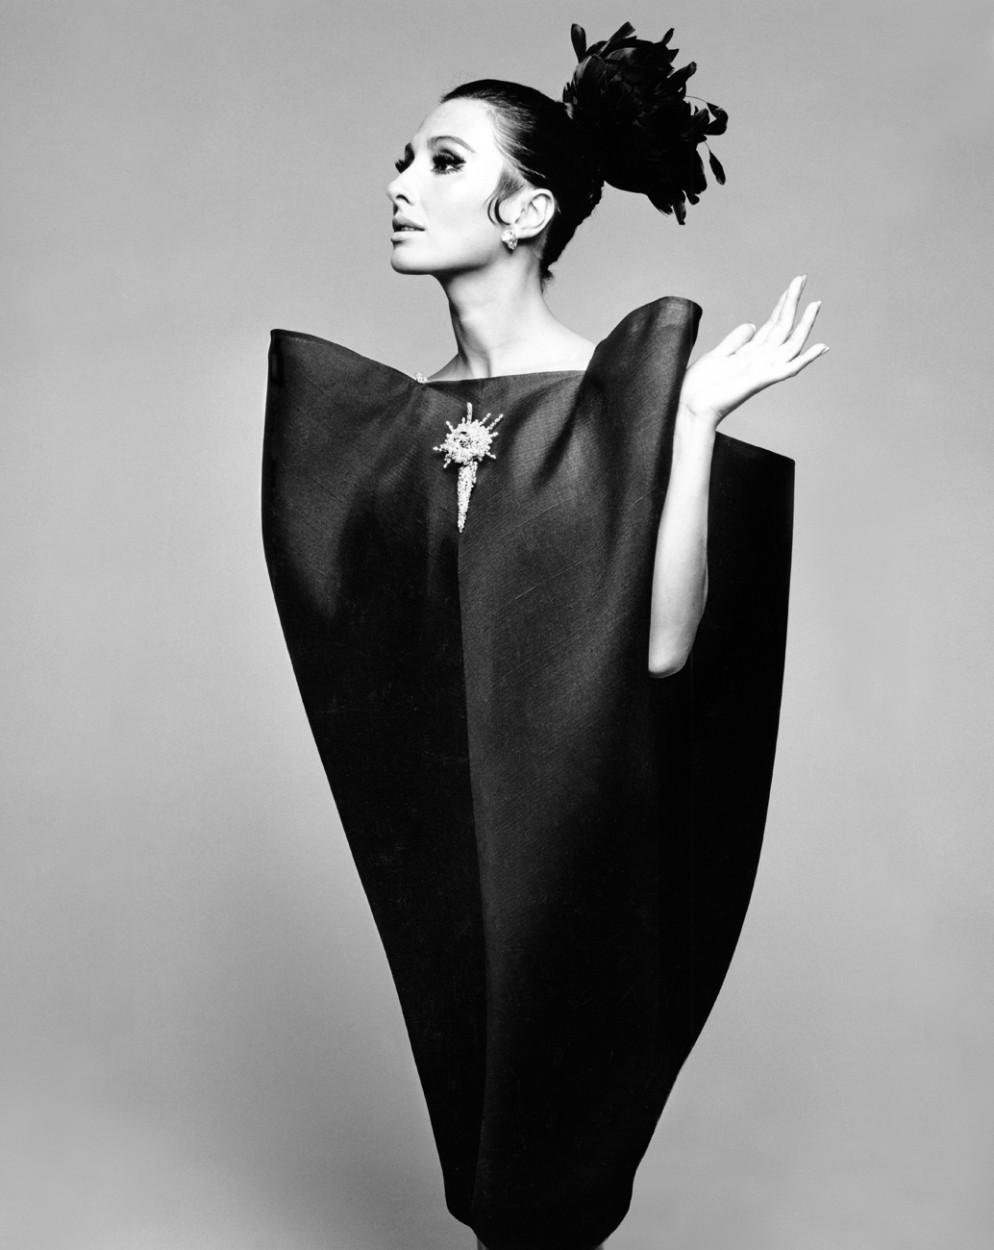 01_Alberta_Tiburzi_in_envelope_dress_by_Cristóbal_Balenciaga_Harpers_Bazaar_June_1967__Hiro_1967